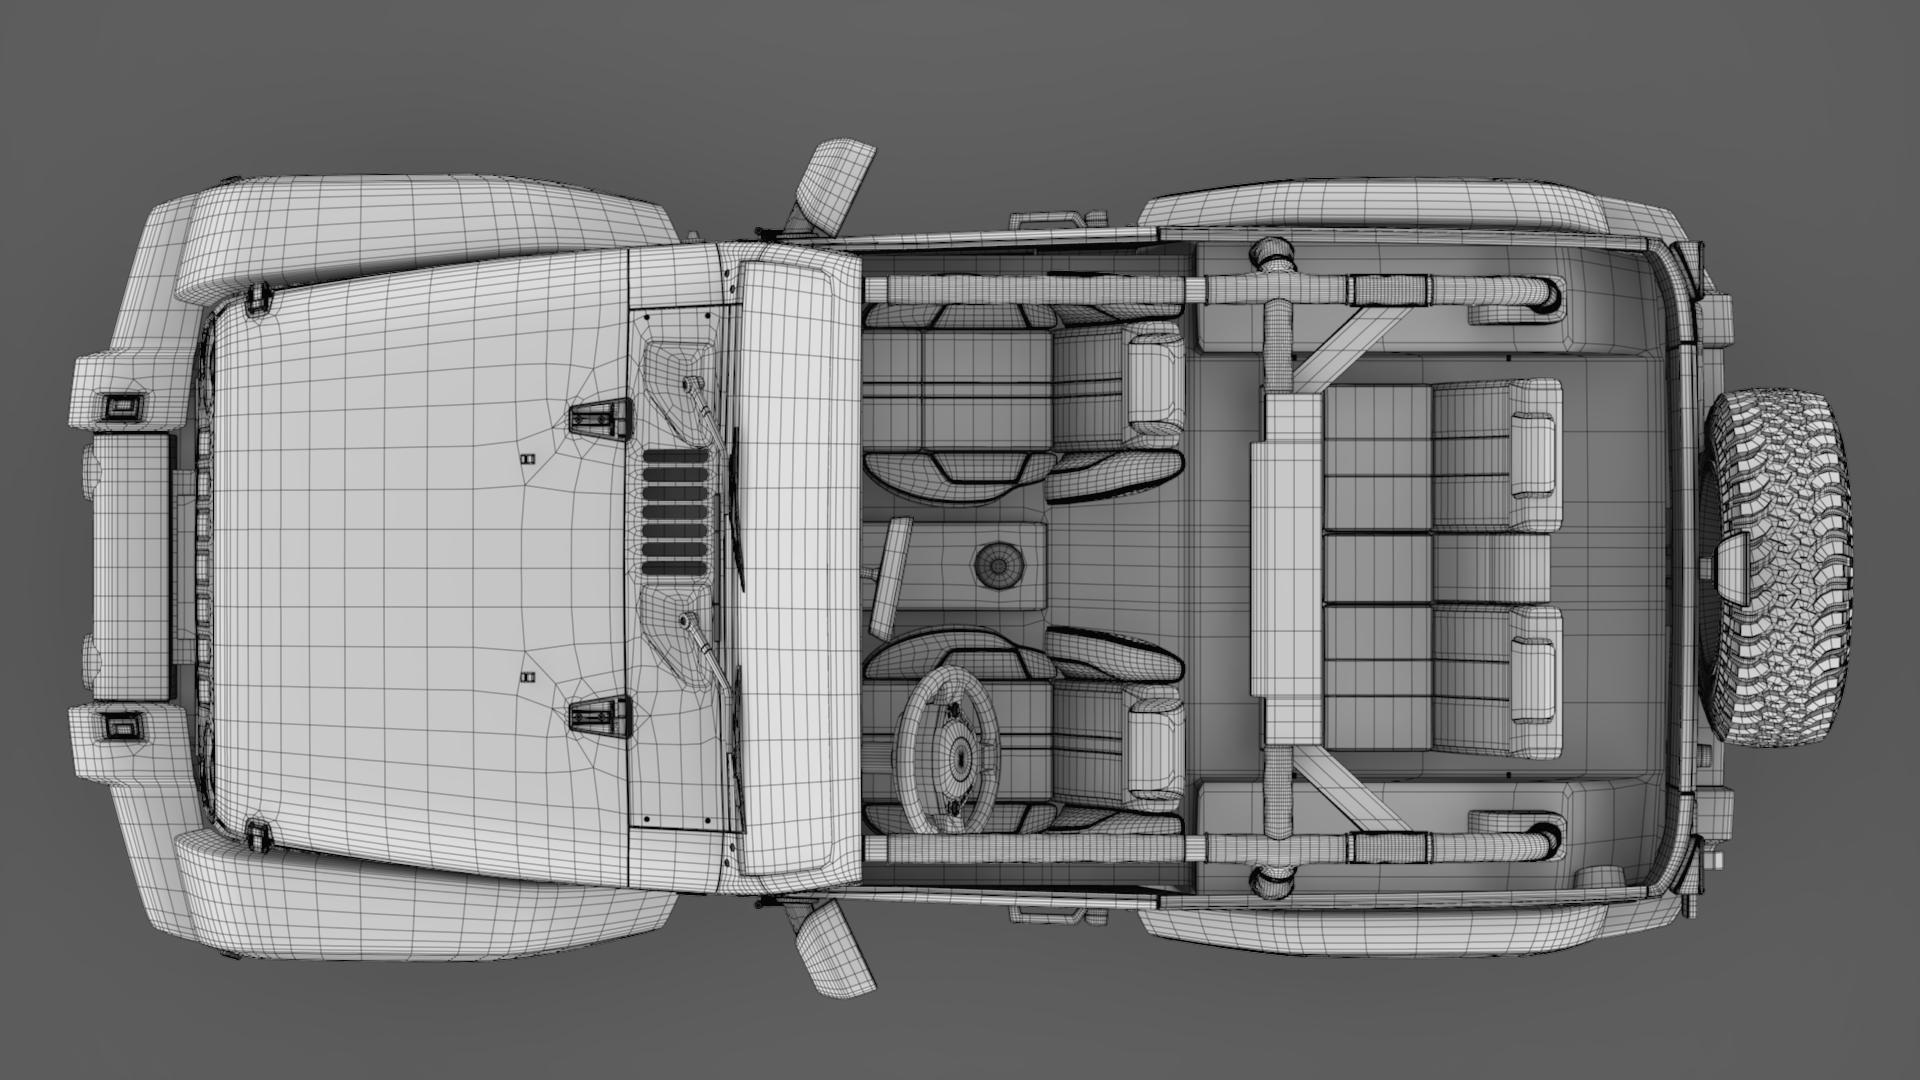 jeep wrangler willys wheeler jk 2017 3d model max fbx c4d lwo ma mb hrc xsi obj 276813